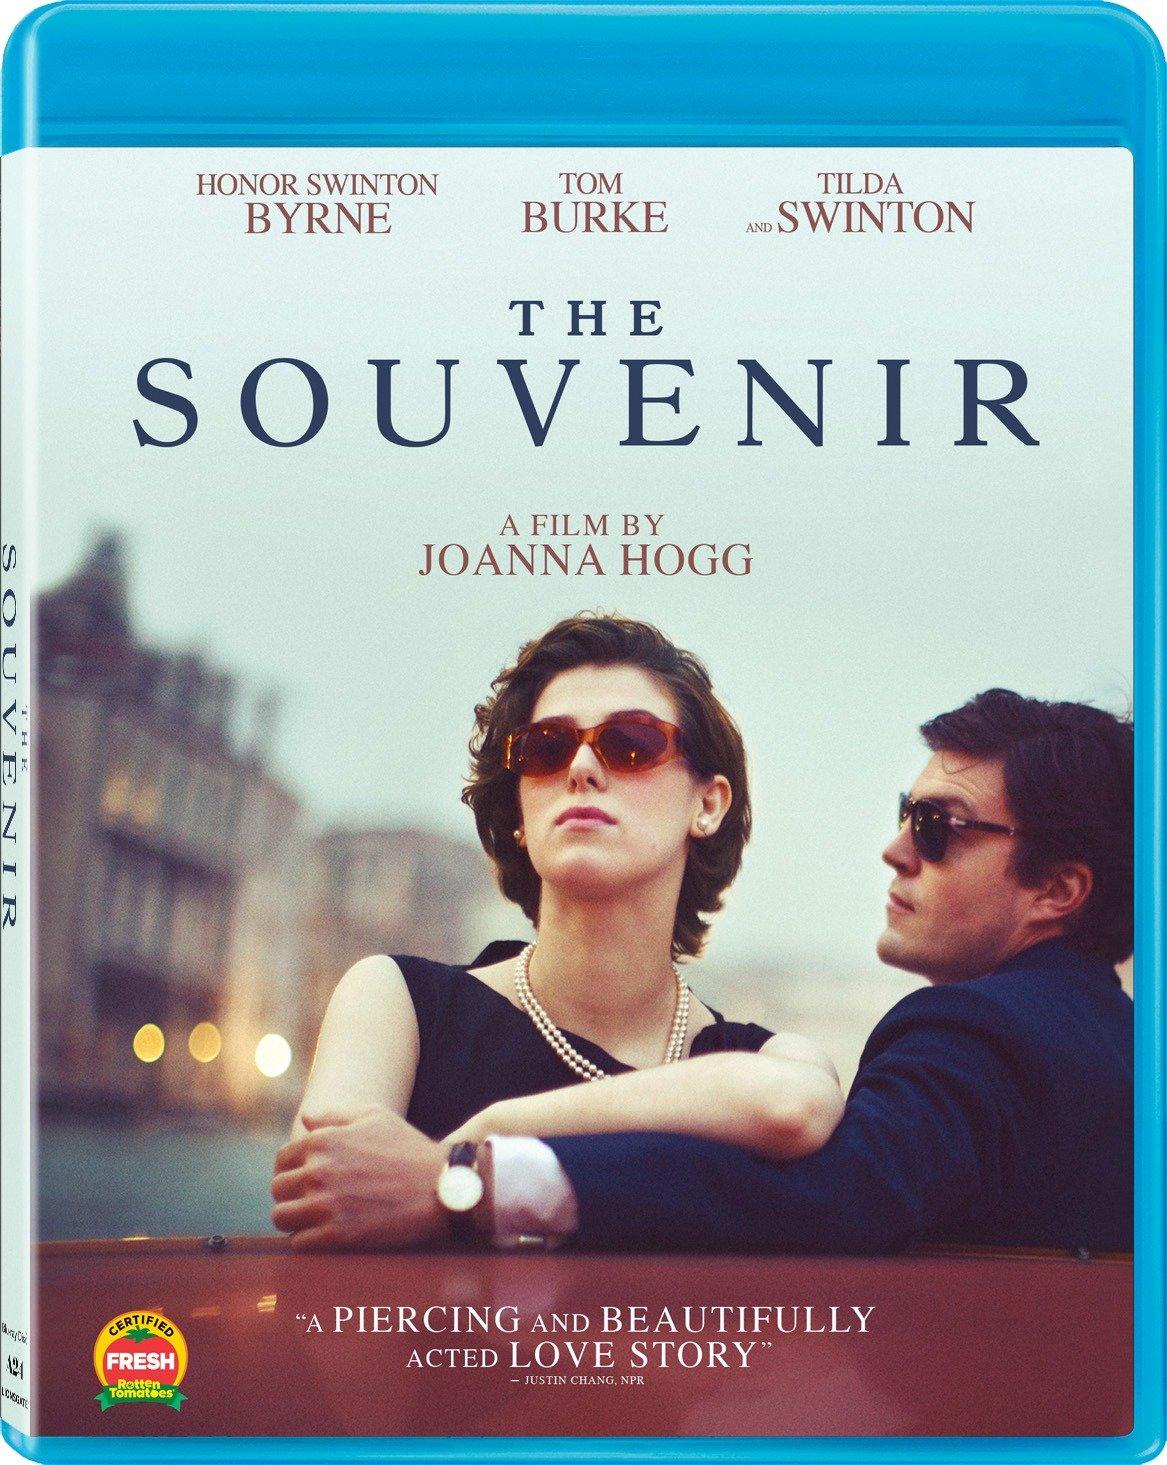 The Souvenir (2019) poster image